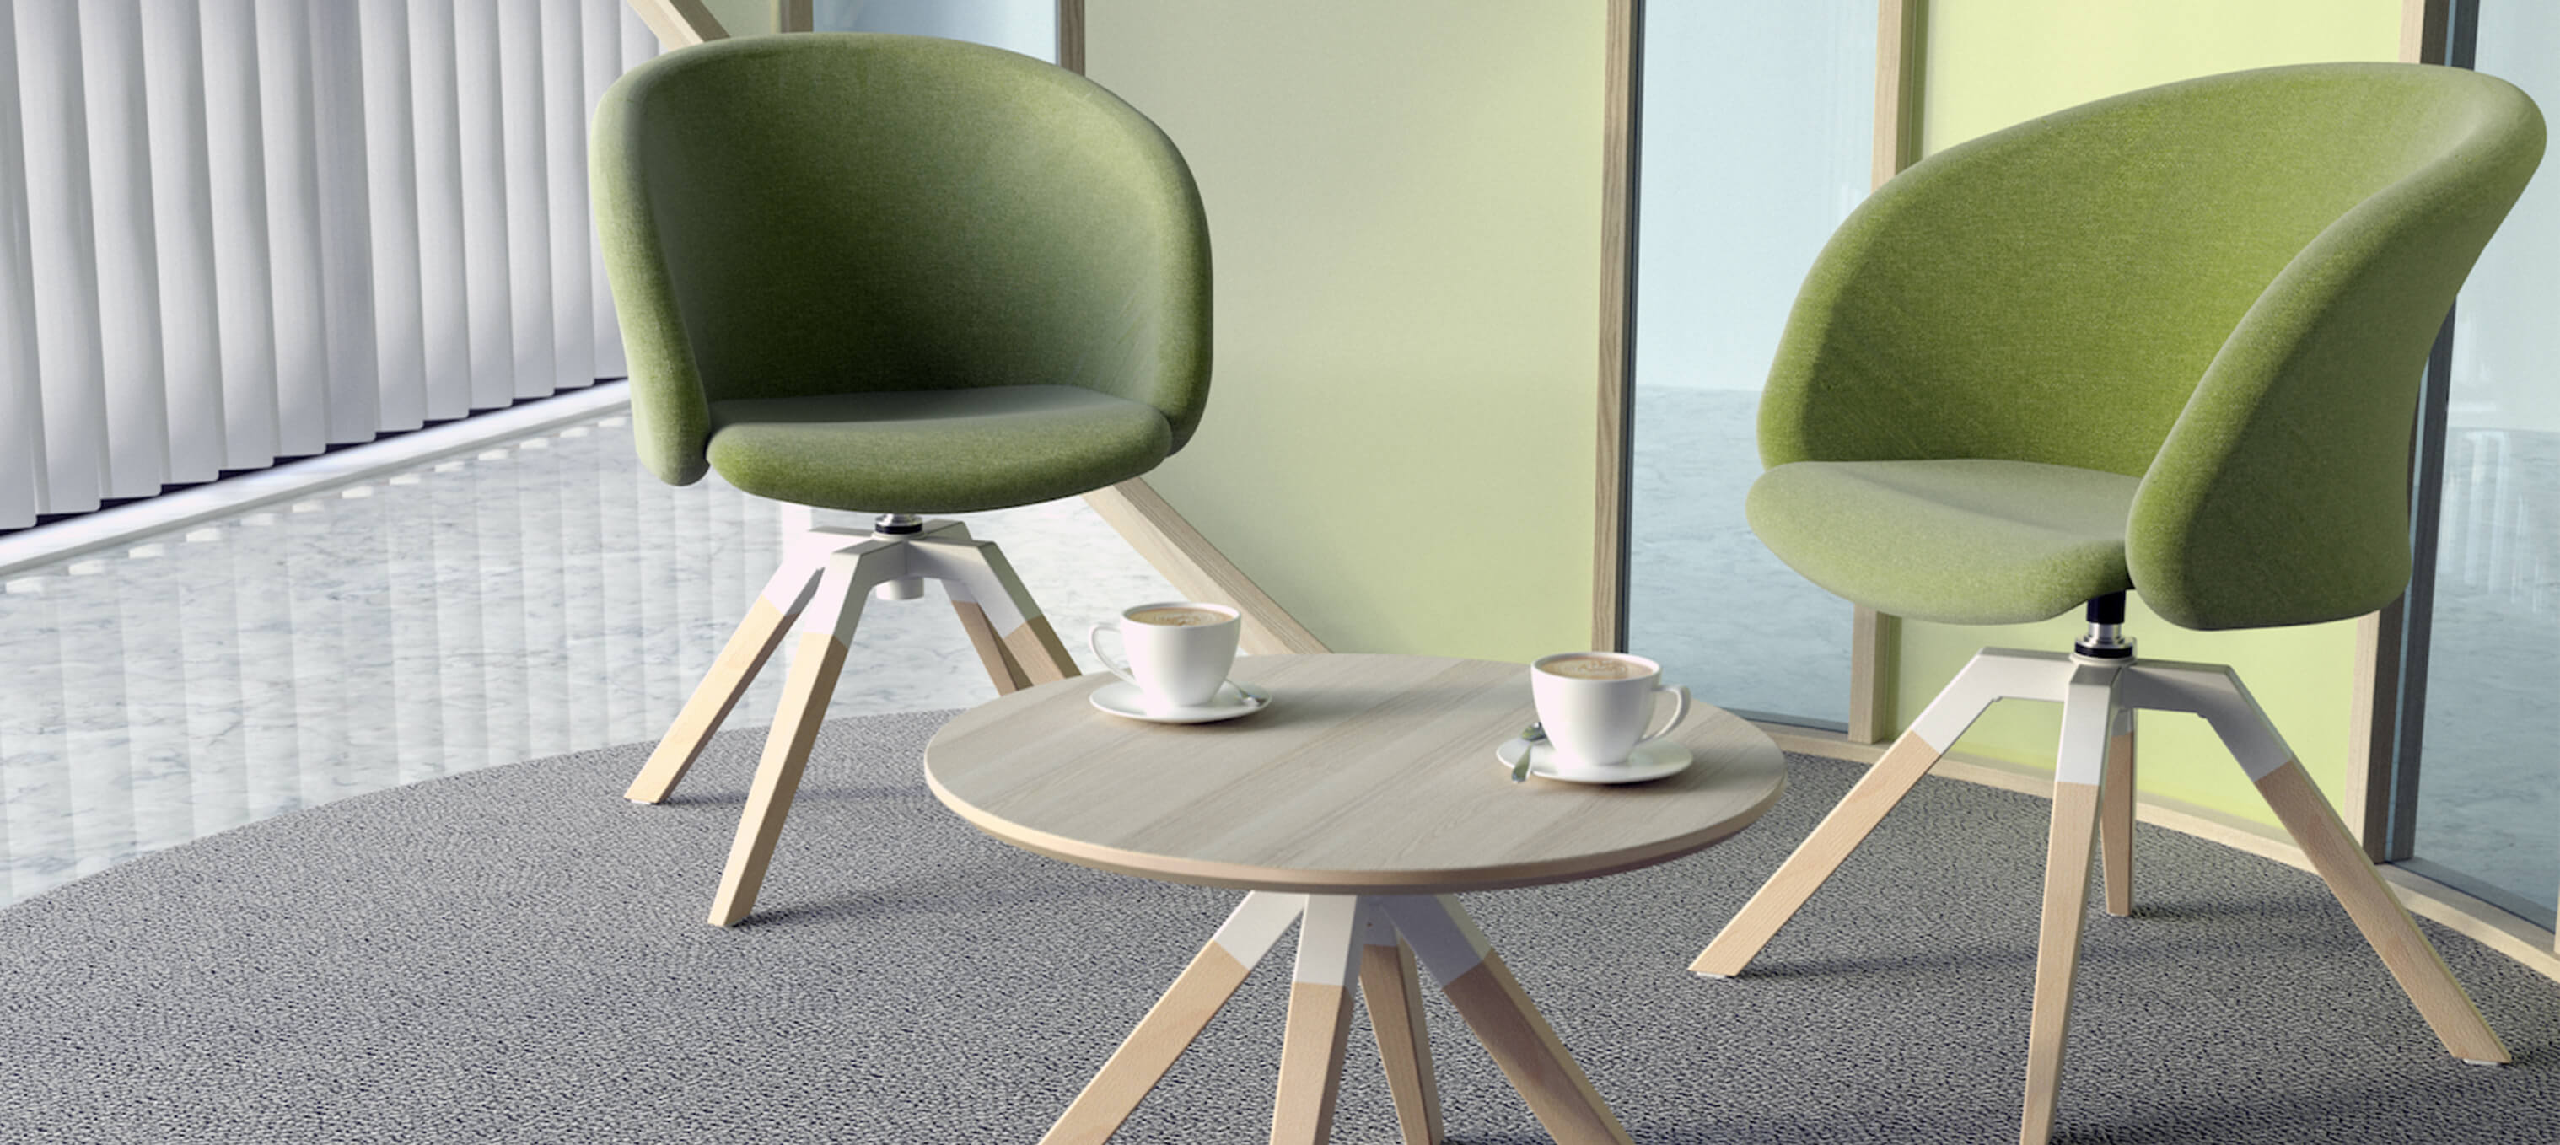 Junea With Coffee Table Hero 2 1500x671